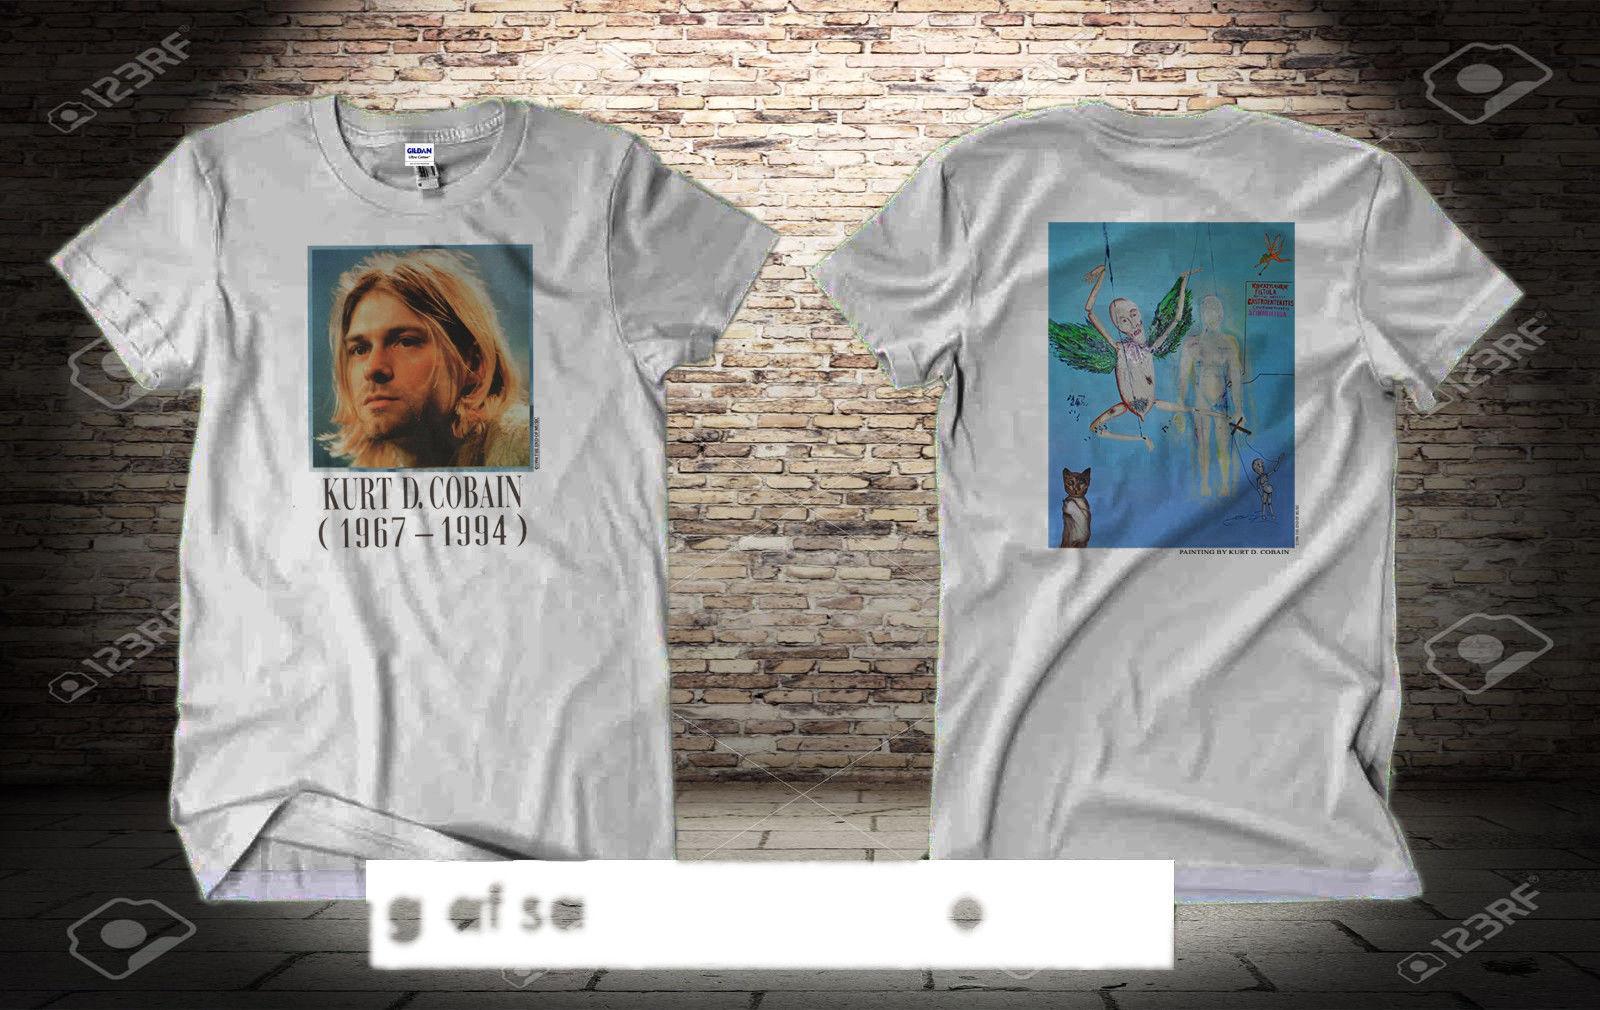 4b52f470f Rare Vintage Nirvana Kurt Cobain 1994 95 White T Shirt Size S 2XL Reprint  2018 Summer Hot Sale 100% Cotton Cool Fashion Funny Print T Shirt Slogans  Dirty T ...